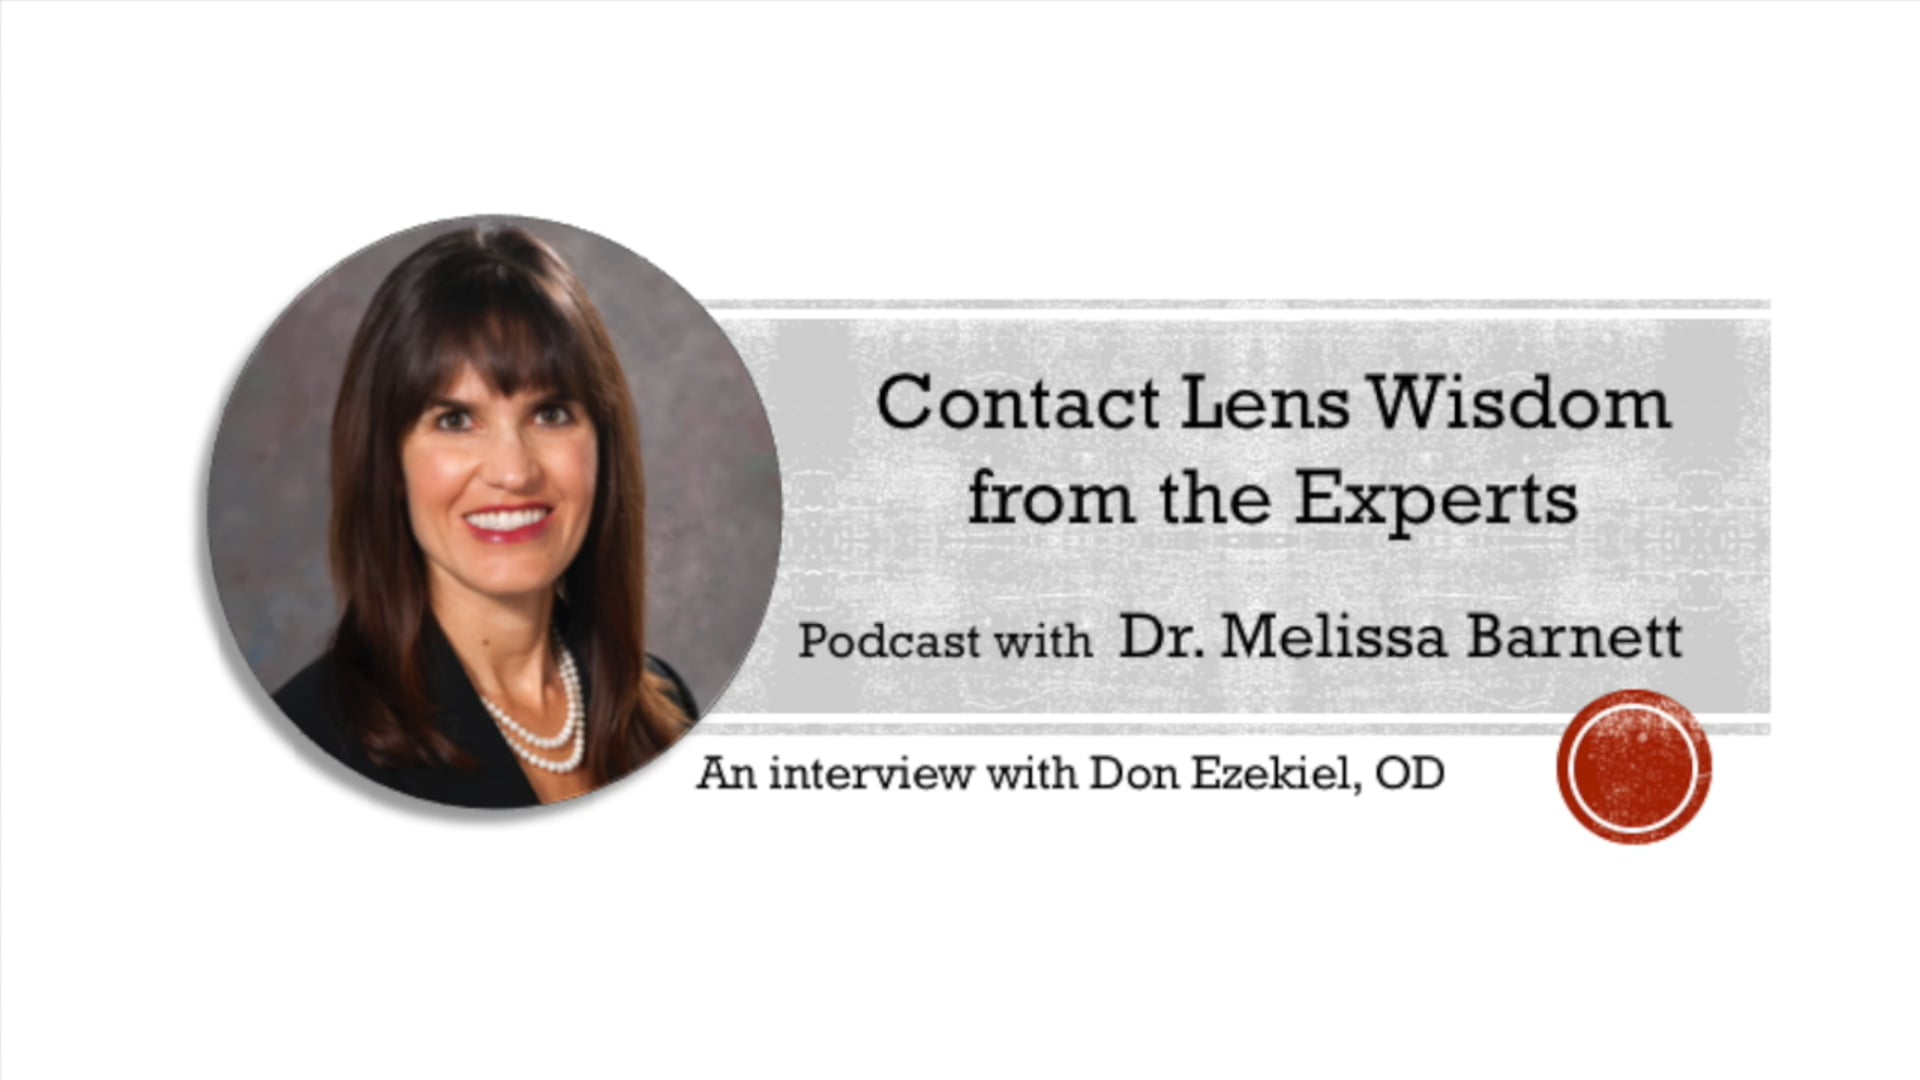 Dr. Melissa Barnett's Contact Lens Wisdom Podcast: Episode 1